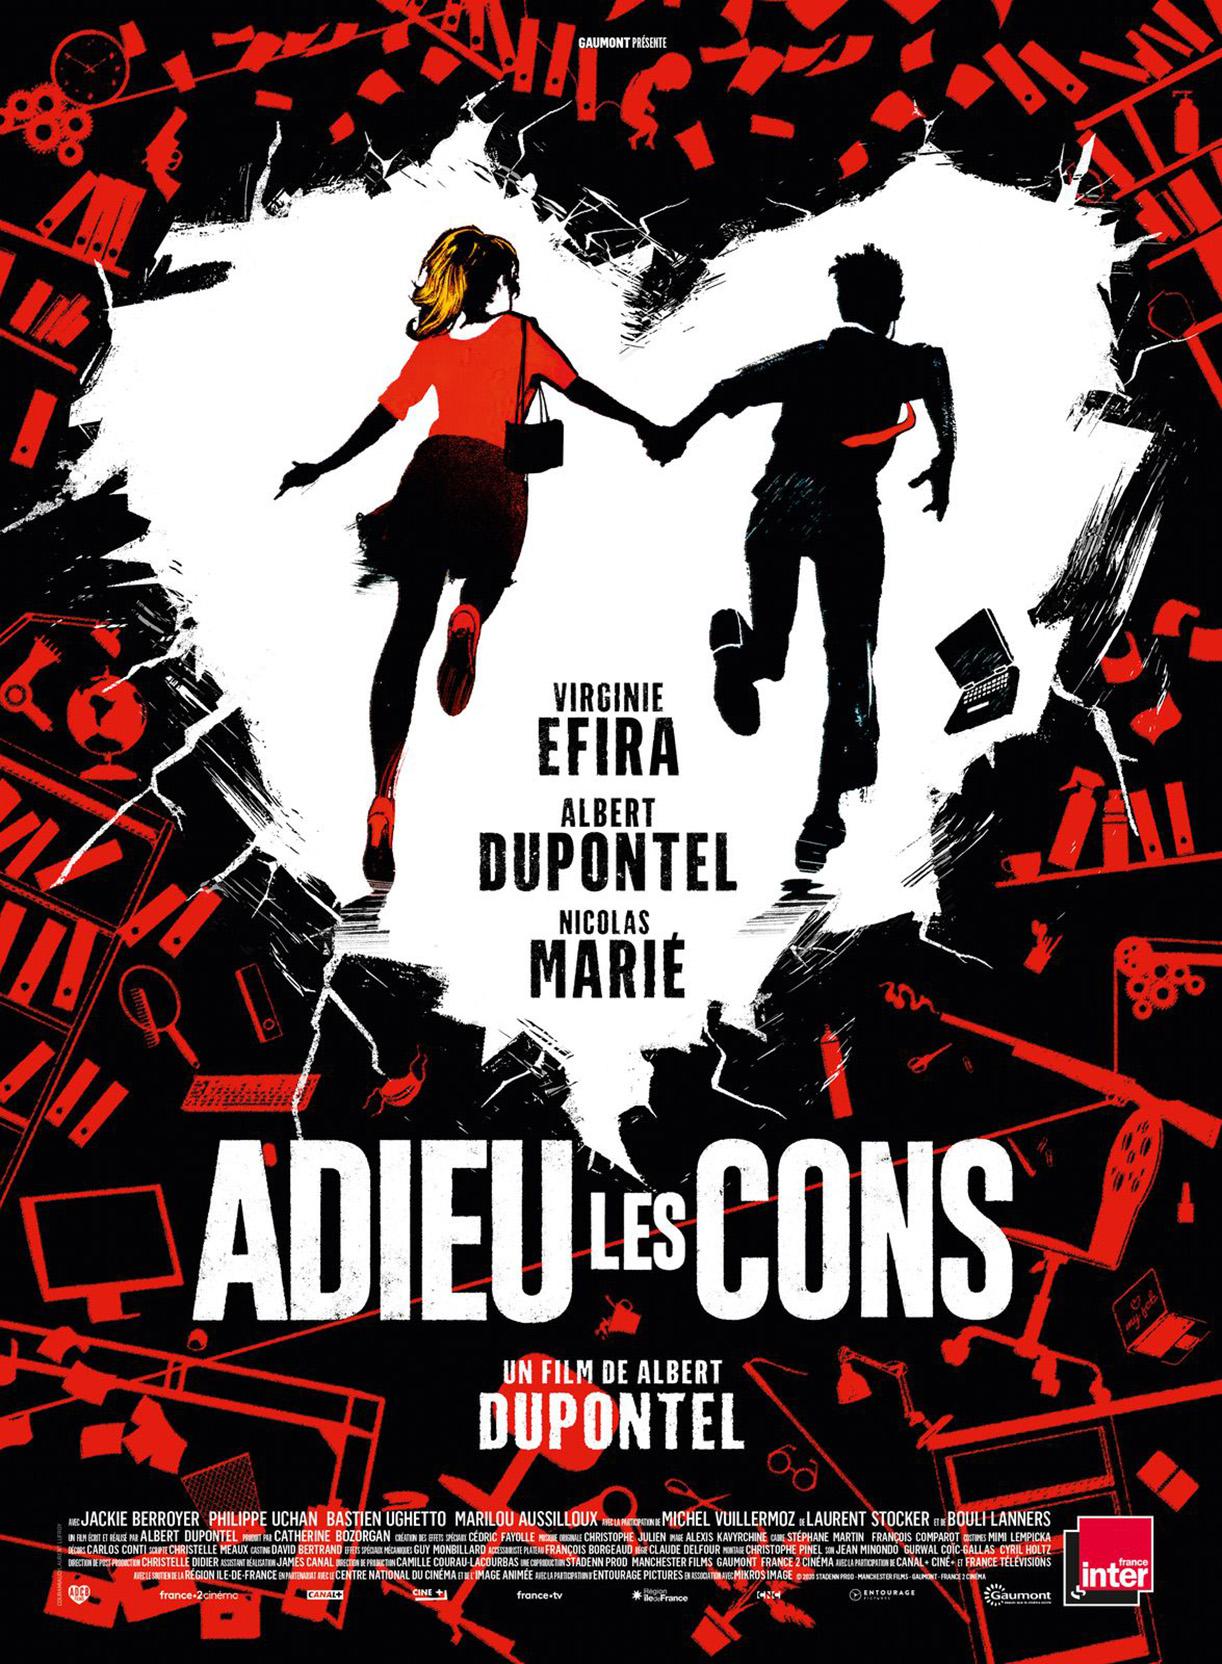 Jérôme Prébois / ADCB Films